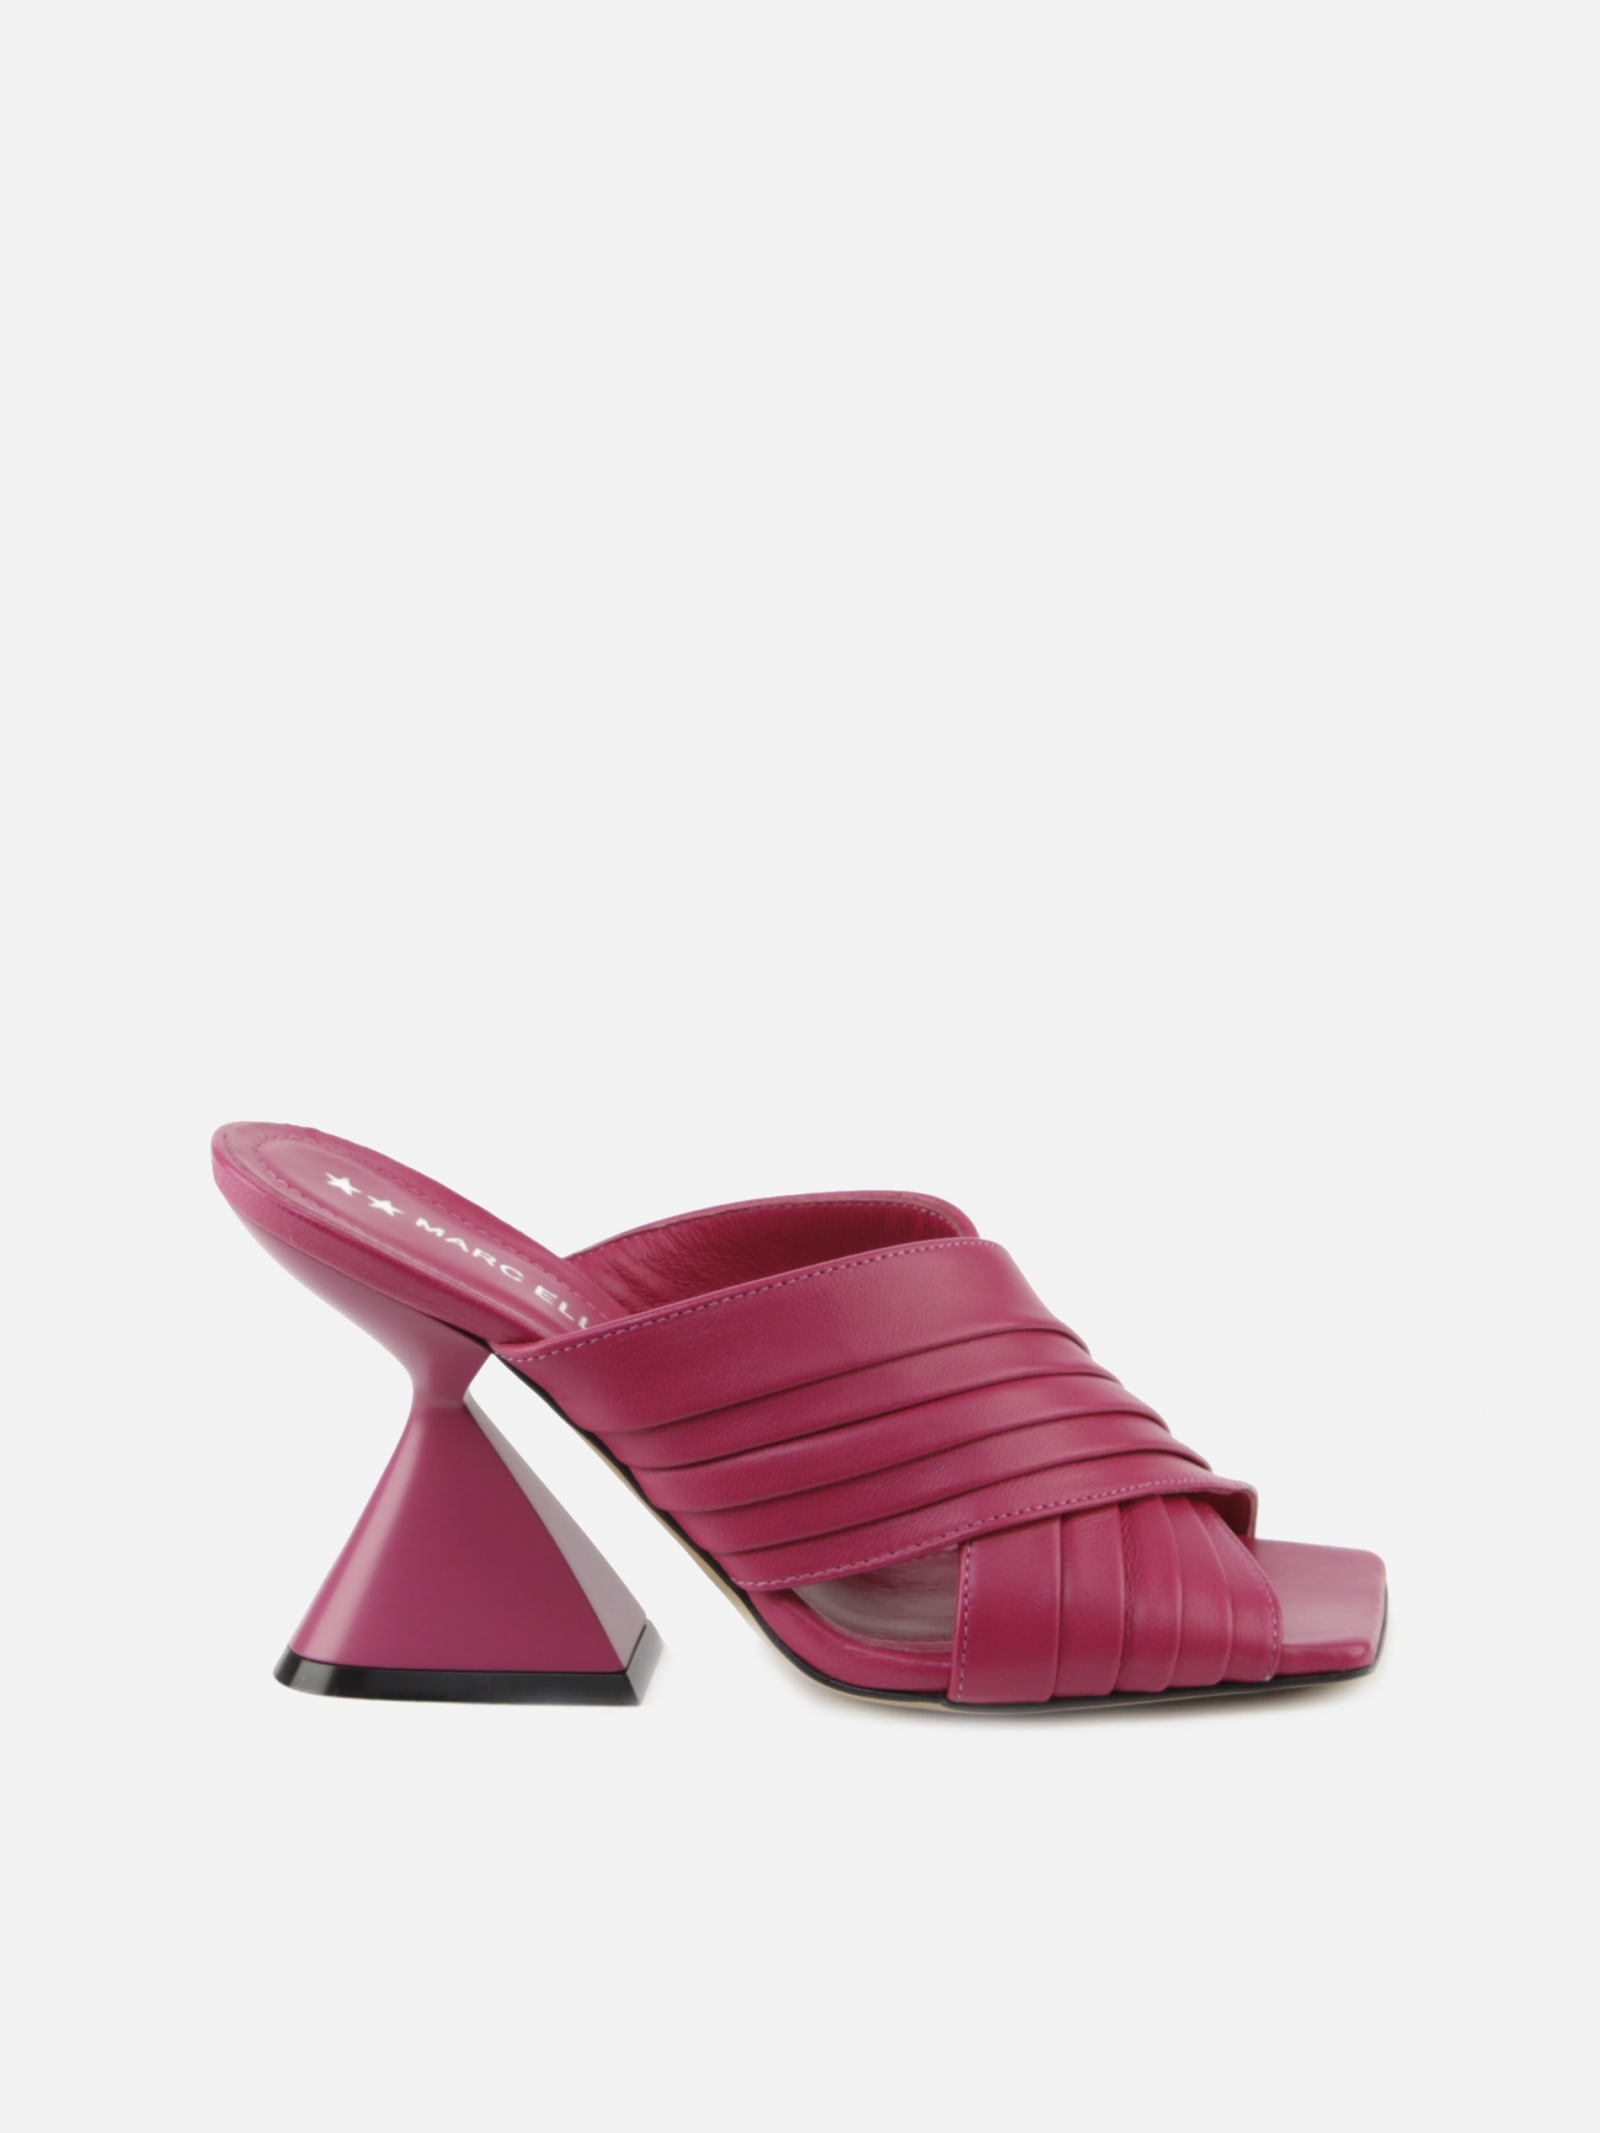 Bondie Leather Sandals